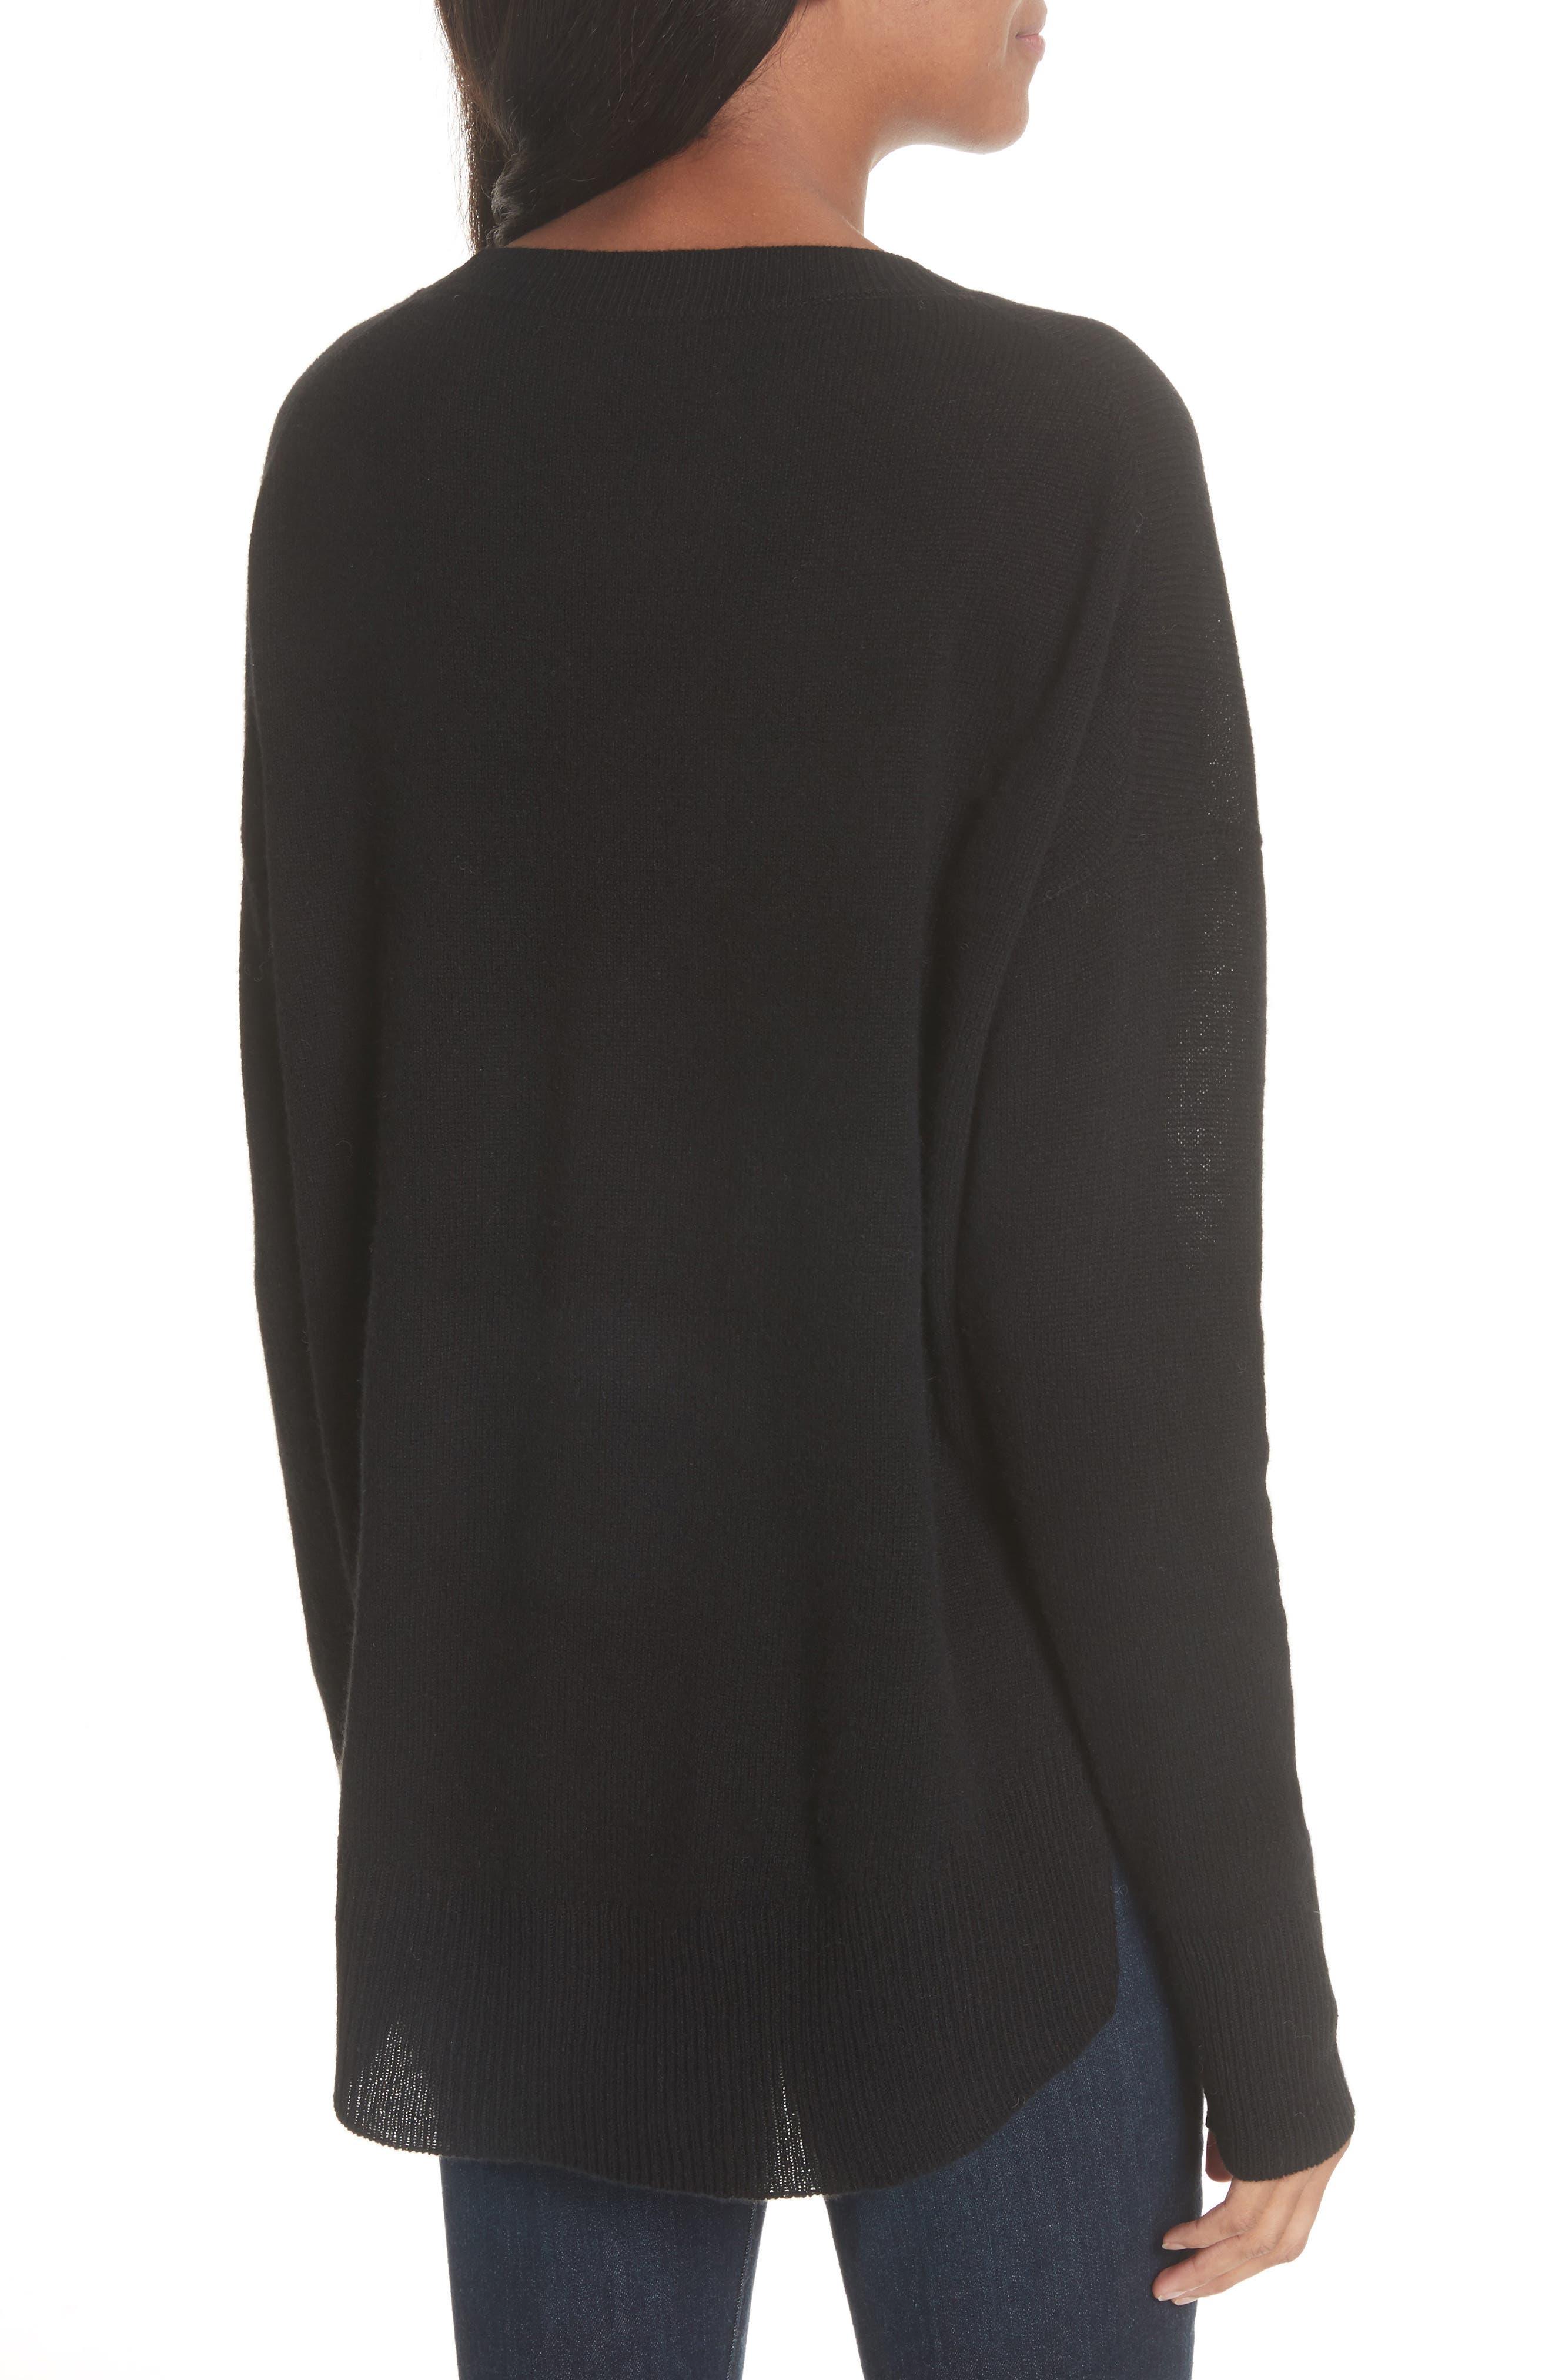 THEORY,                             Karenia L Cashmere Sweater,                             Alternate thumbnail 2, color,                             001